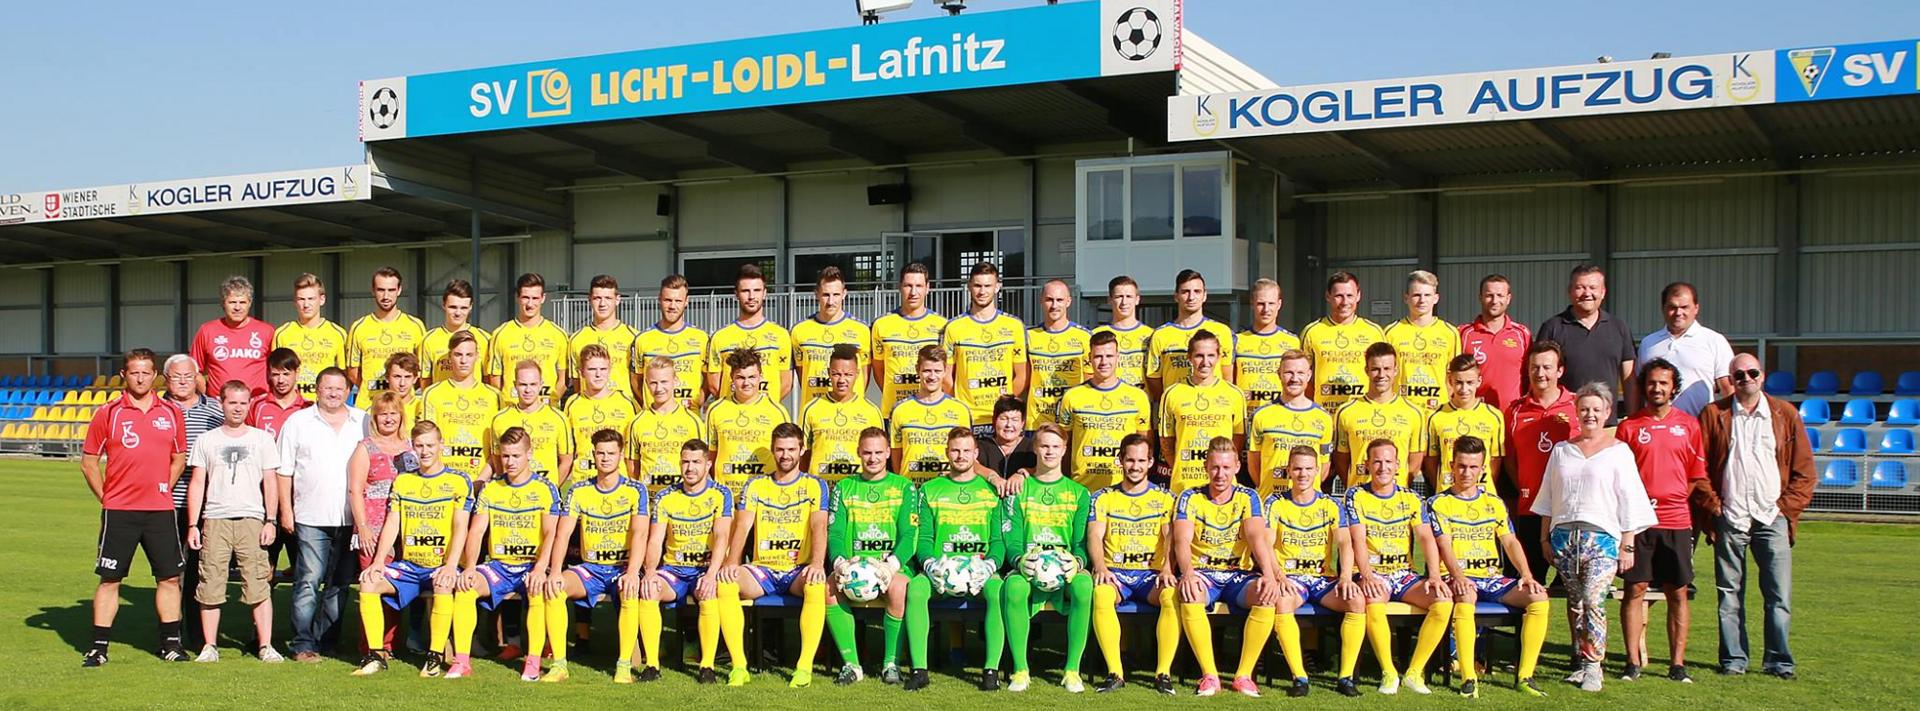 Team title image